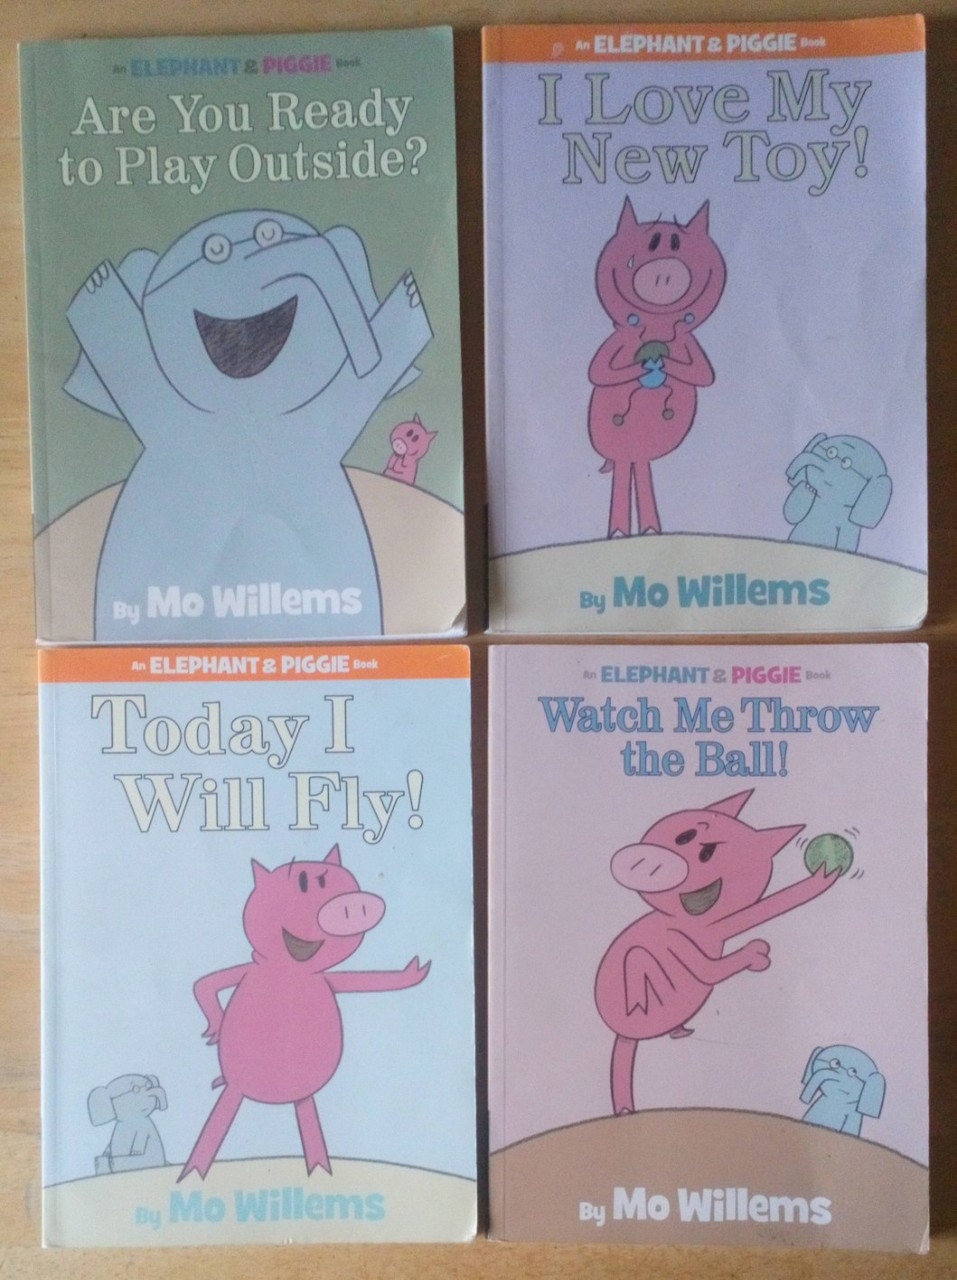 Willems, Mo - 4 Book Lot Illustrated Children's Books - Elephant & Piggie Books